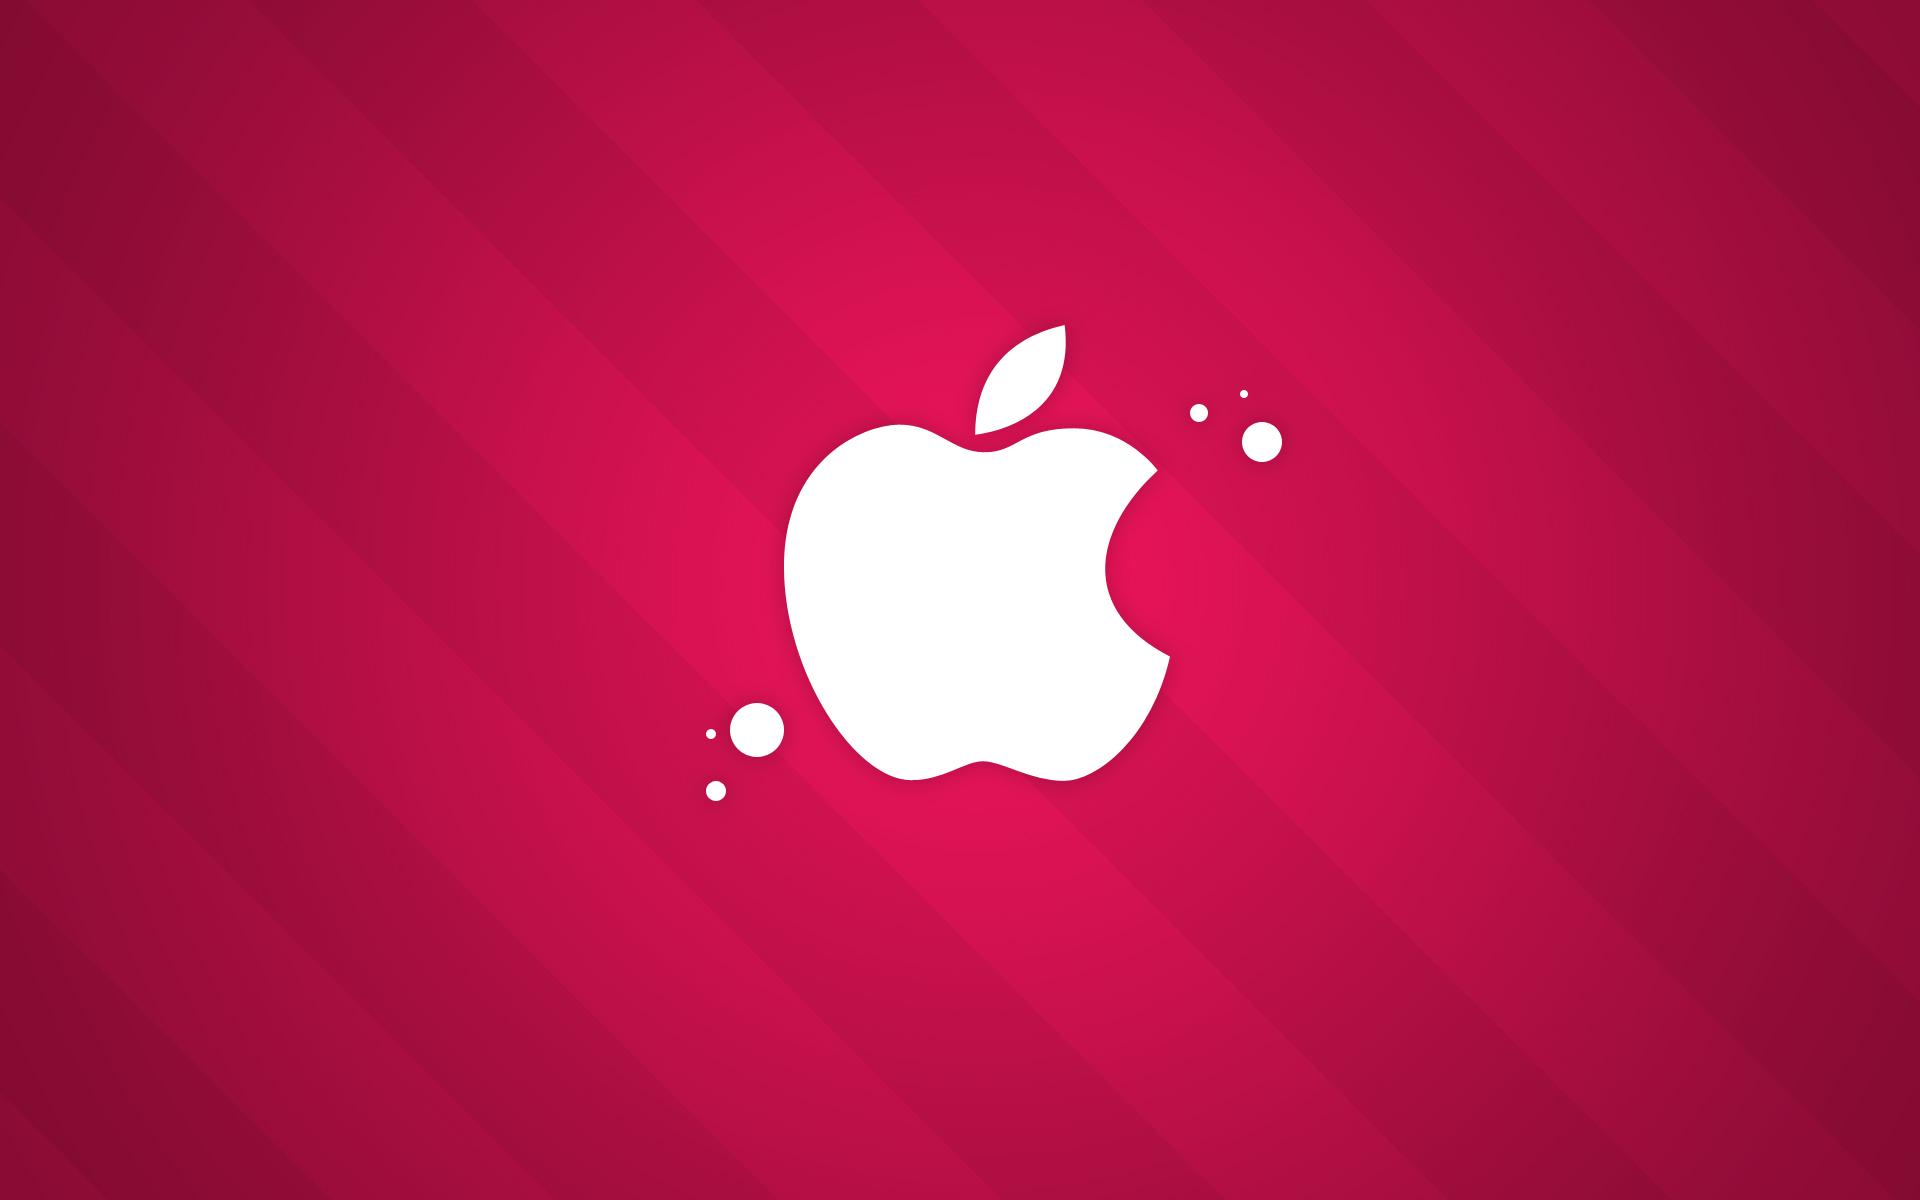 Tremendous 50 Free Apple Wallpaper Desktop On Wallpapersafari Complete Home Design Collection Epsylindsey Bellcom